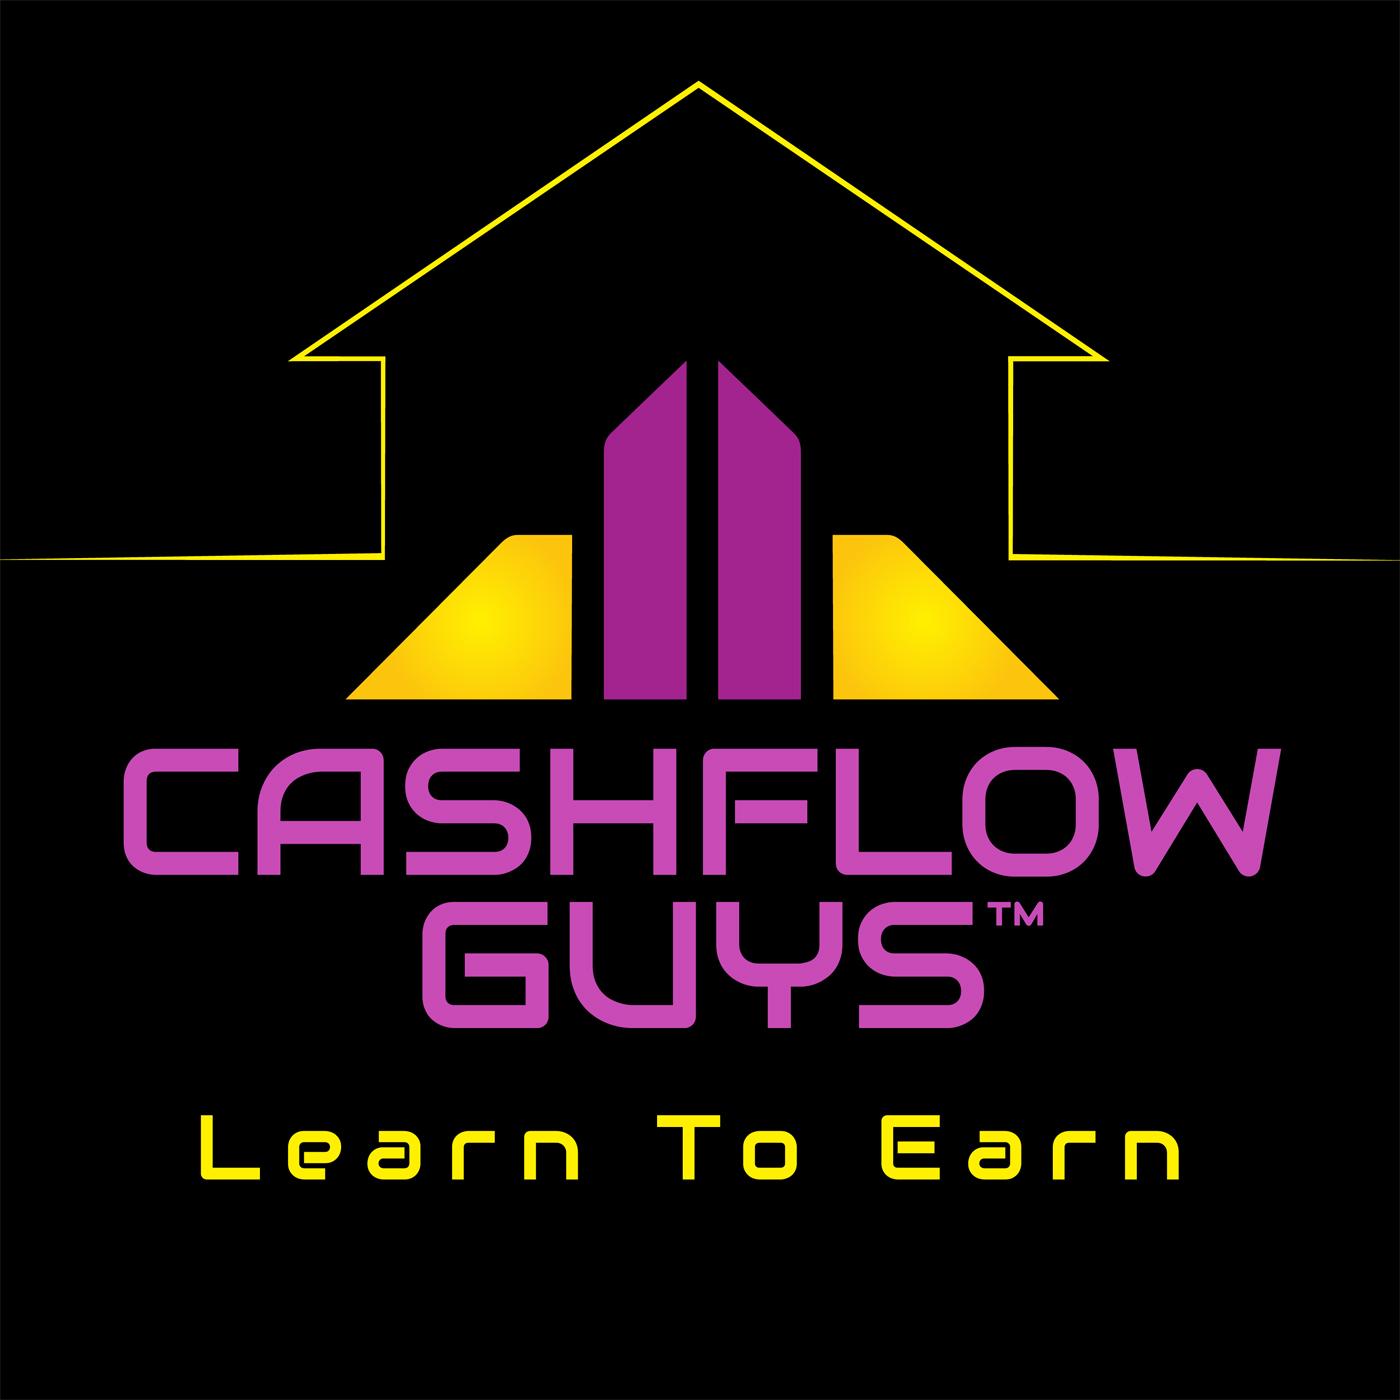 Cash Flow Guys | Real Estate Investing & Cashflow Ideas - Inspired by Robert Kiyosaki / Rich Dad Poor Dad